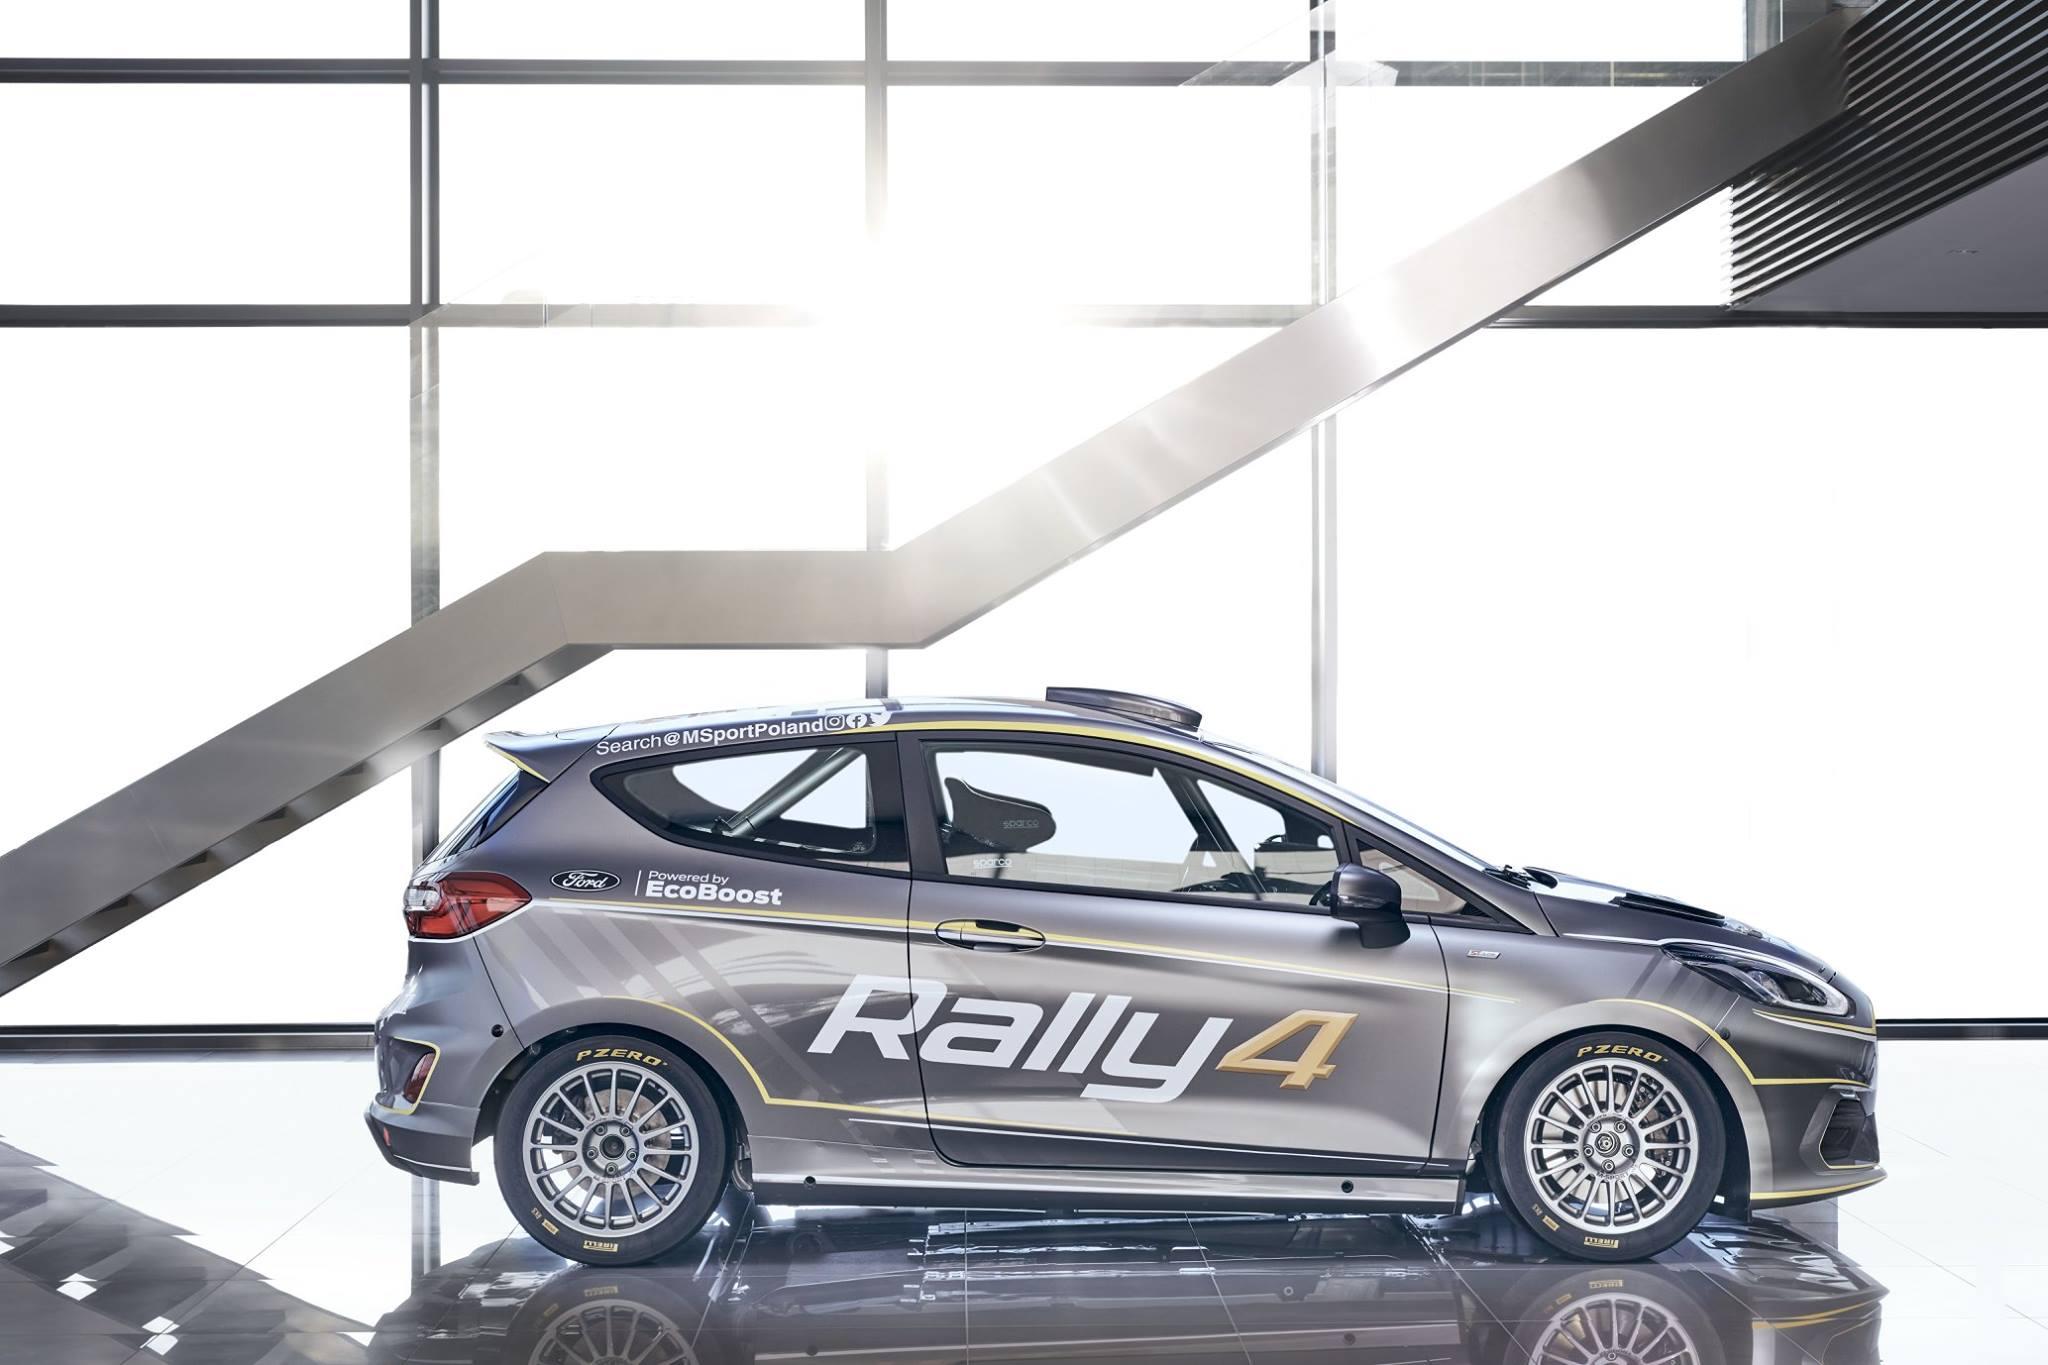 Ford_Fiesta_Rally4_0002